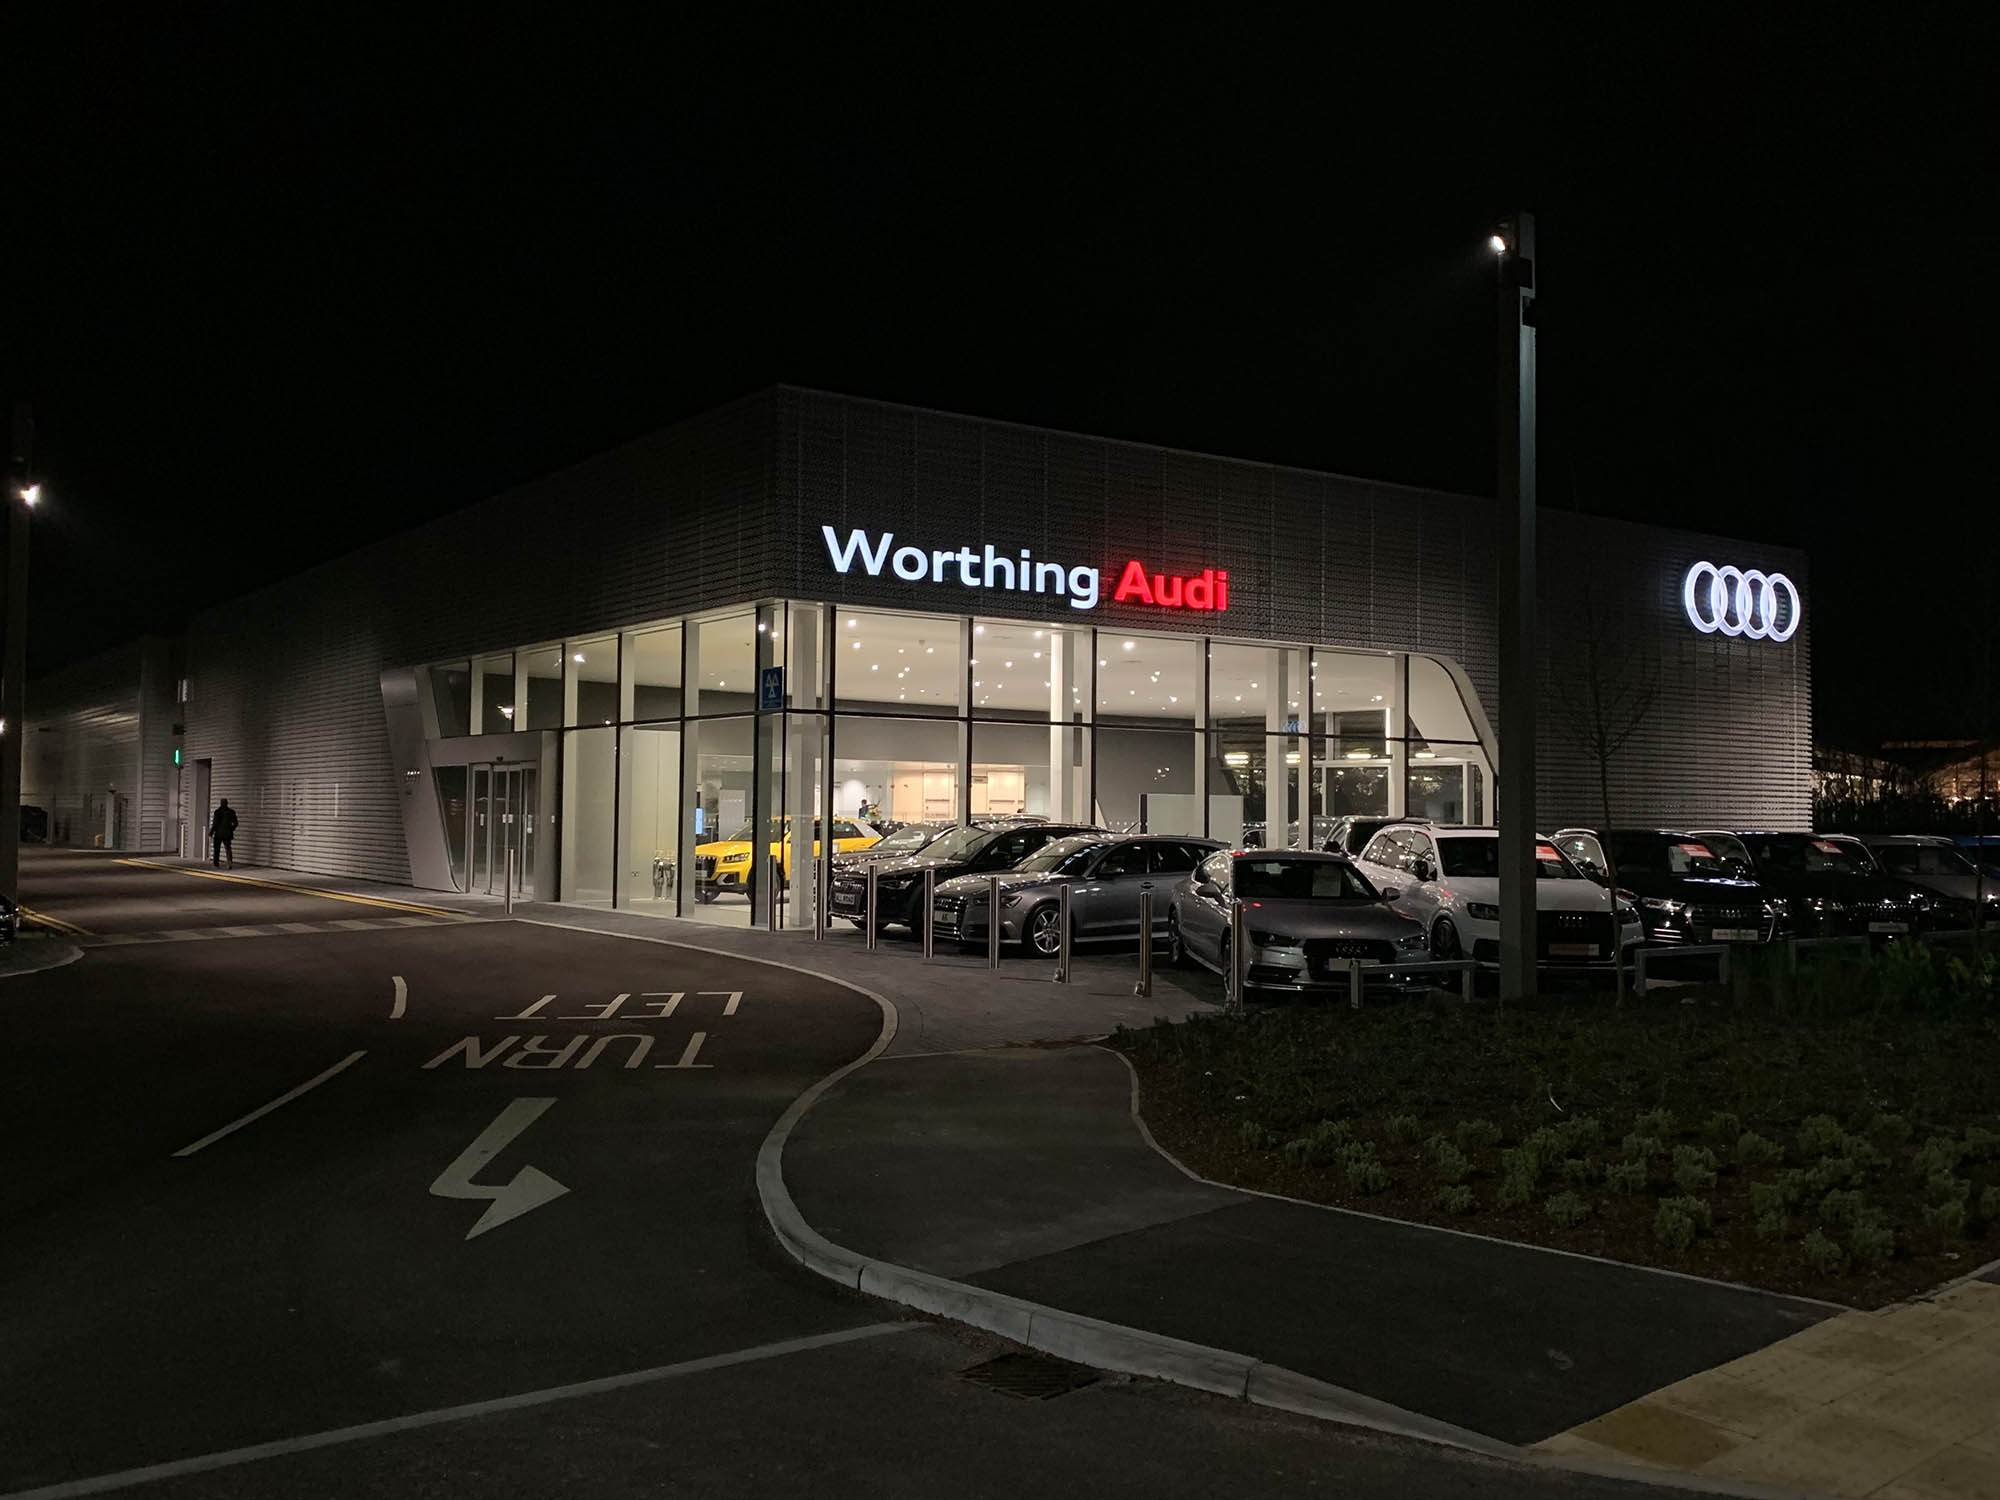 Audi worthing caffyns